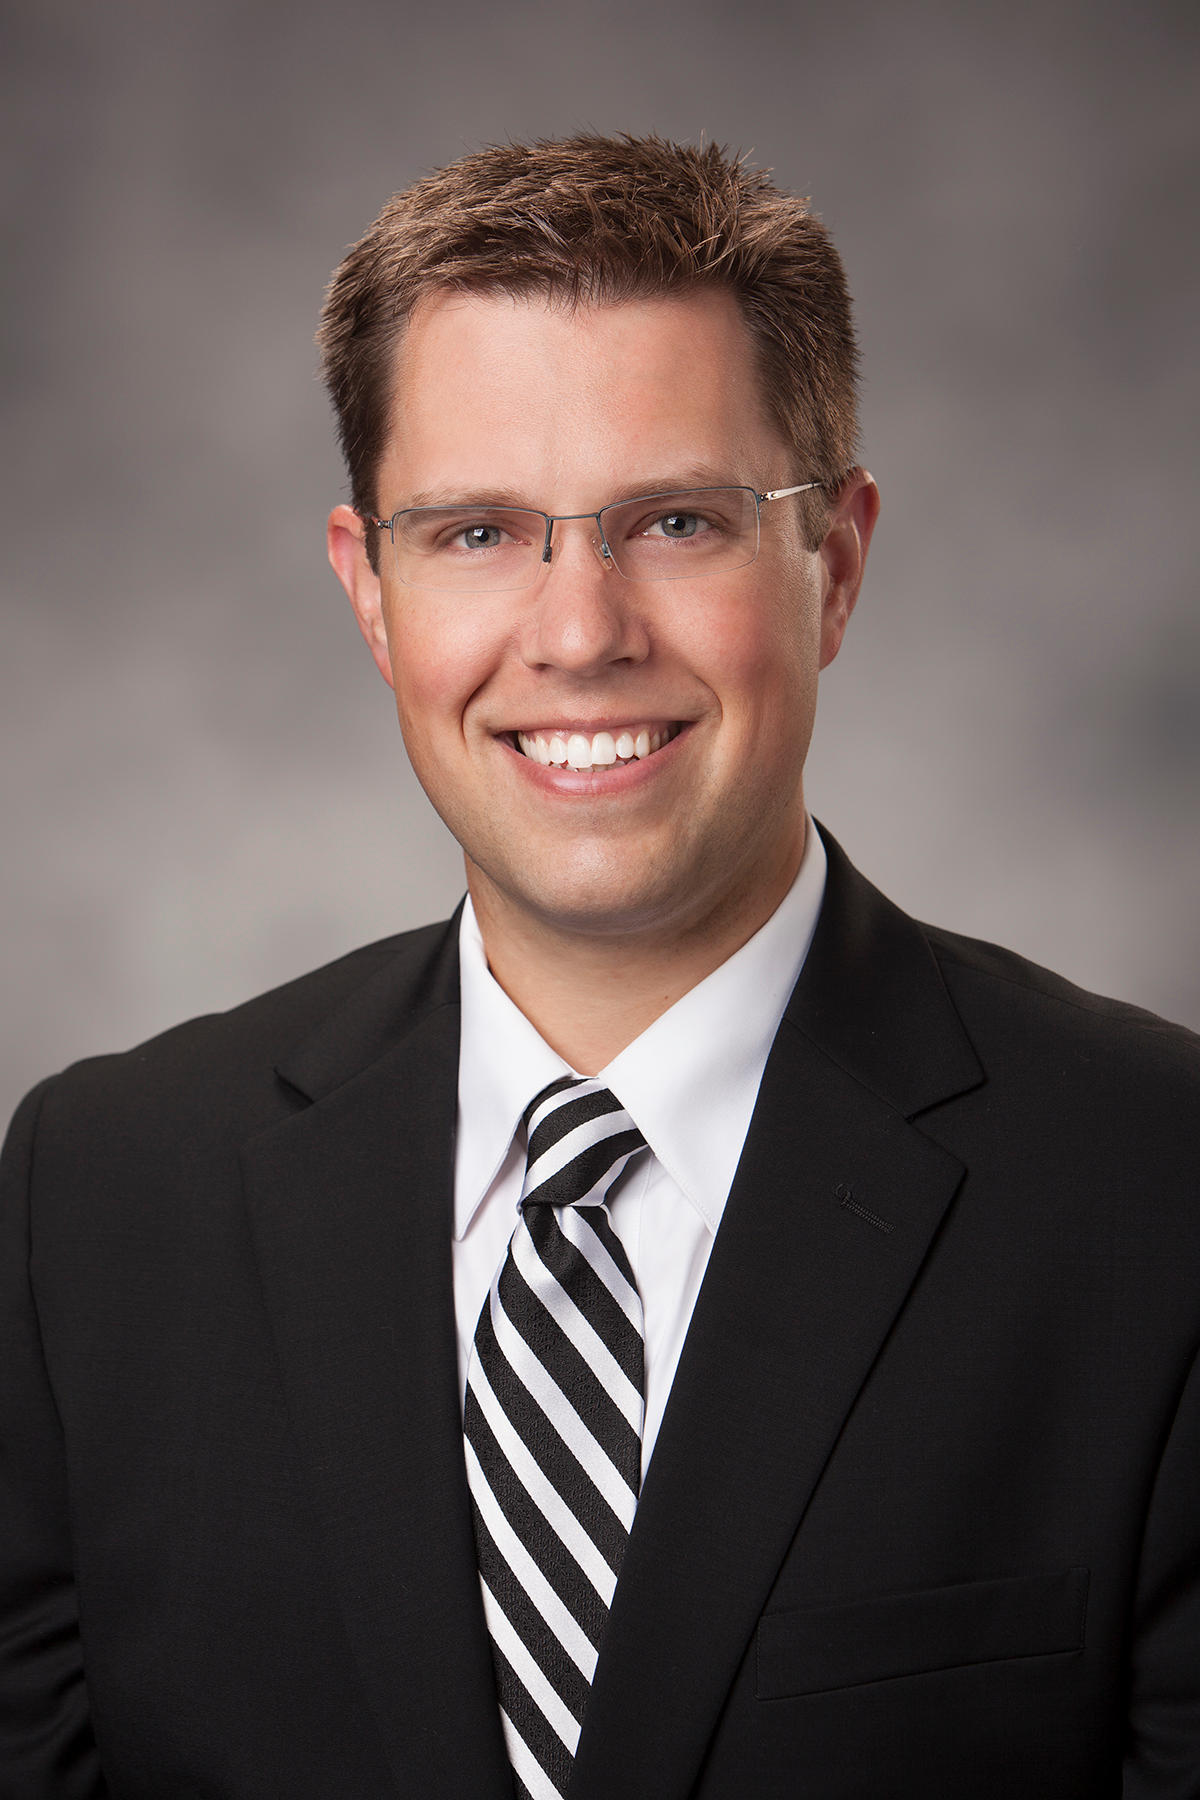 Michael Stellmaker, Md